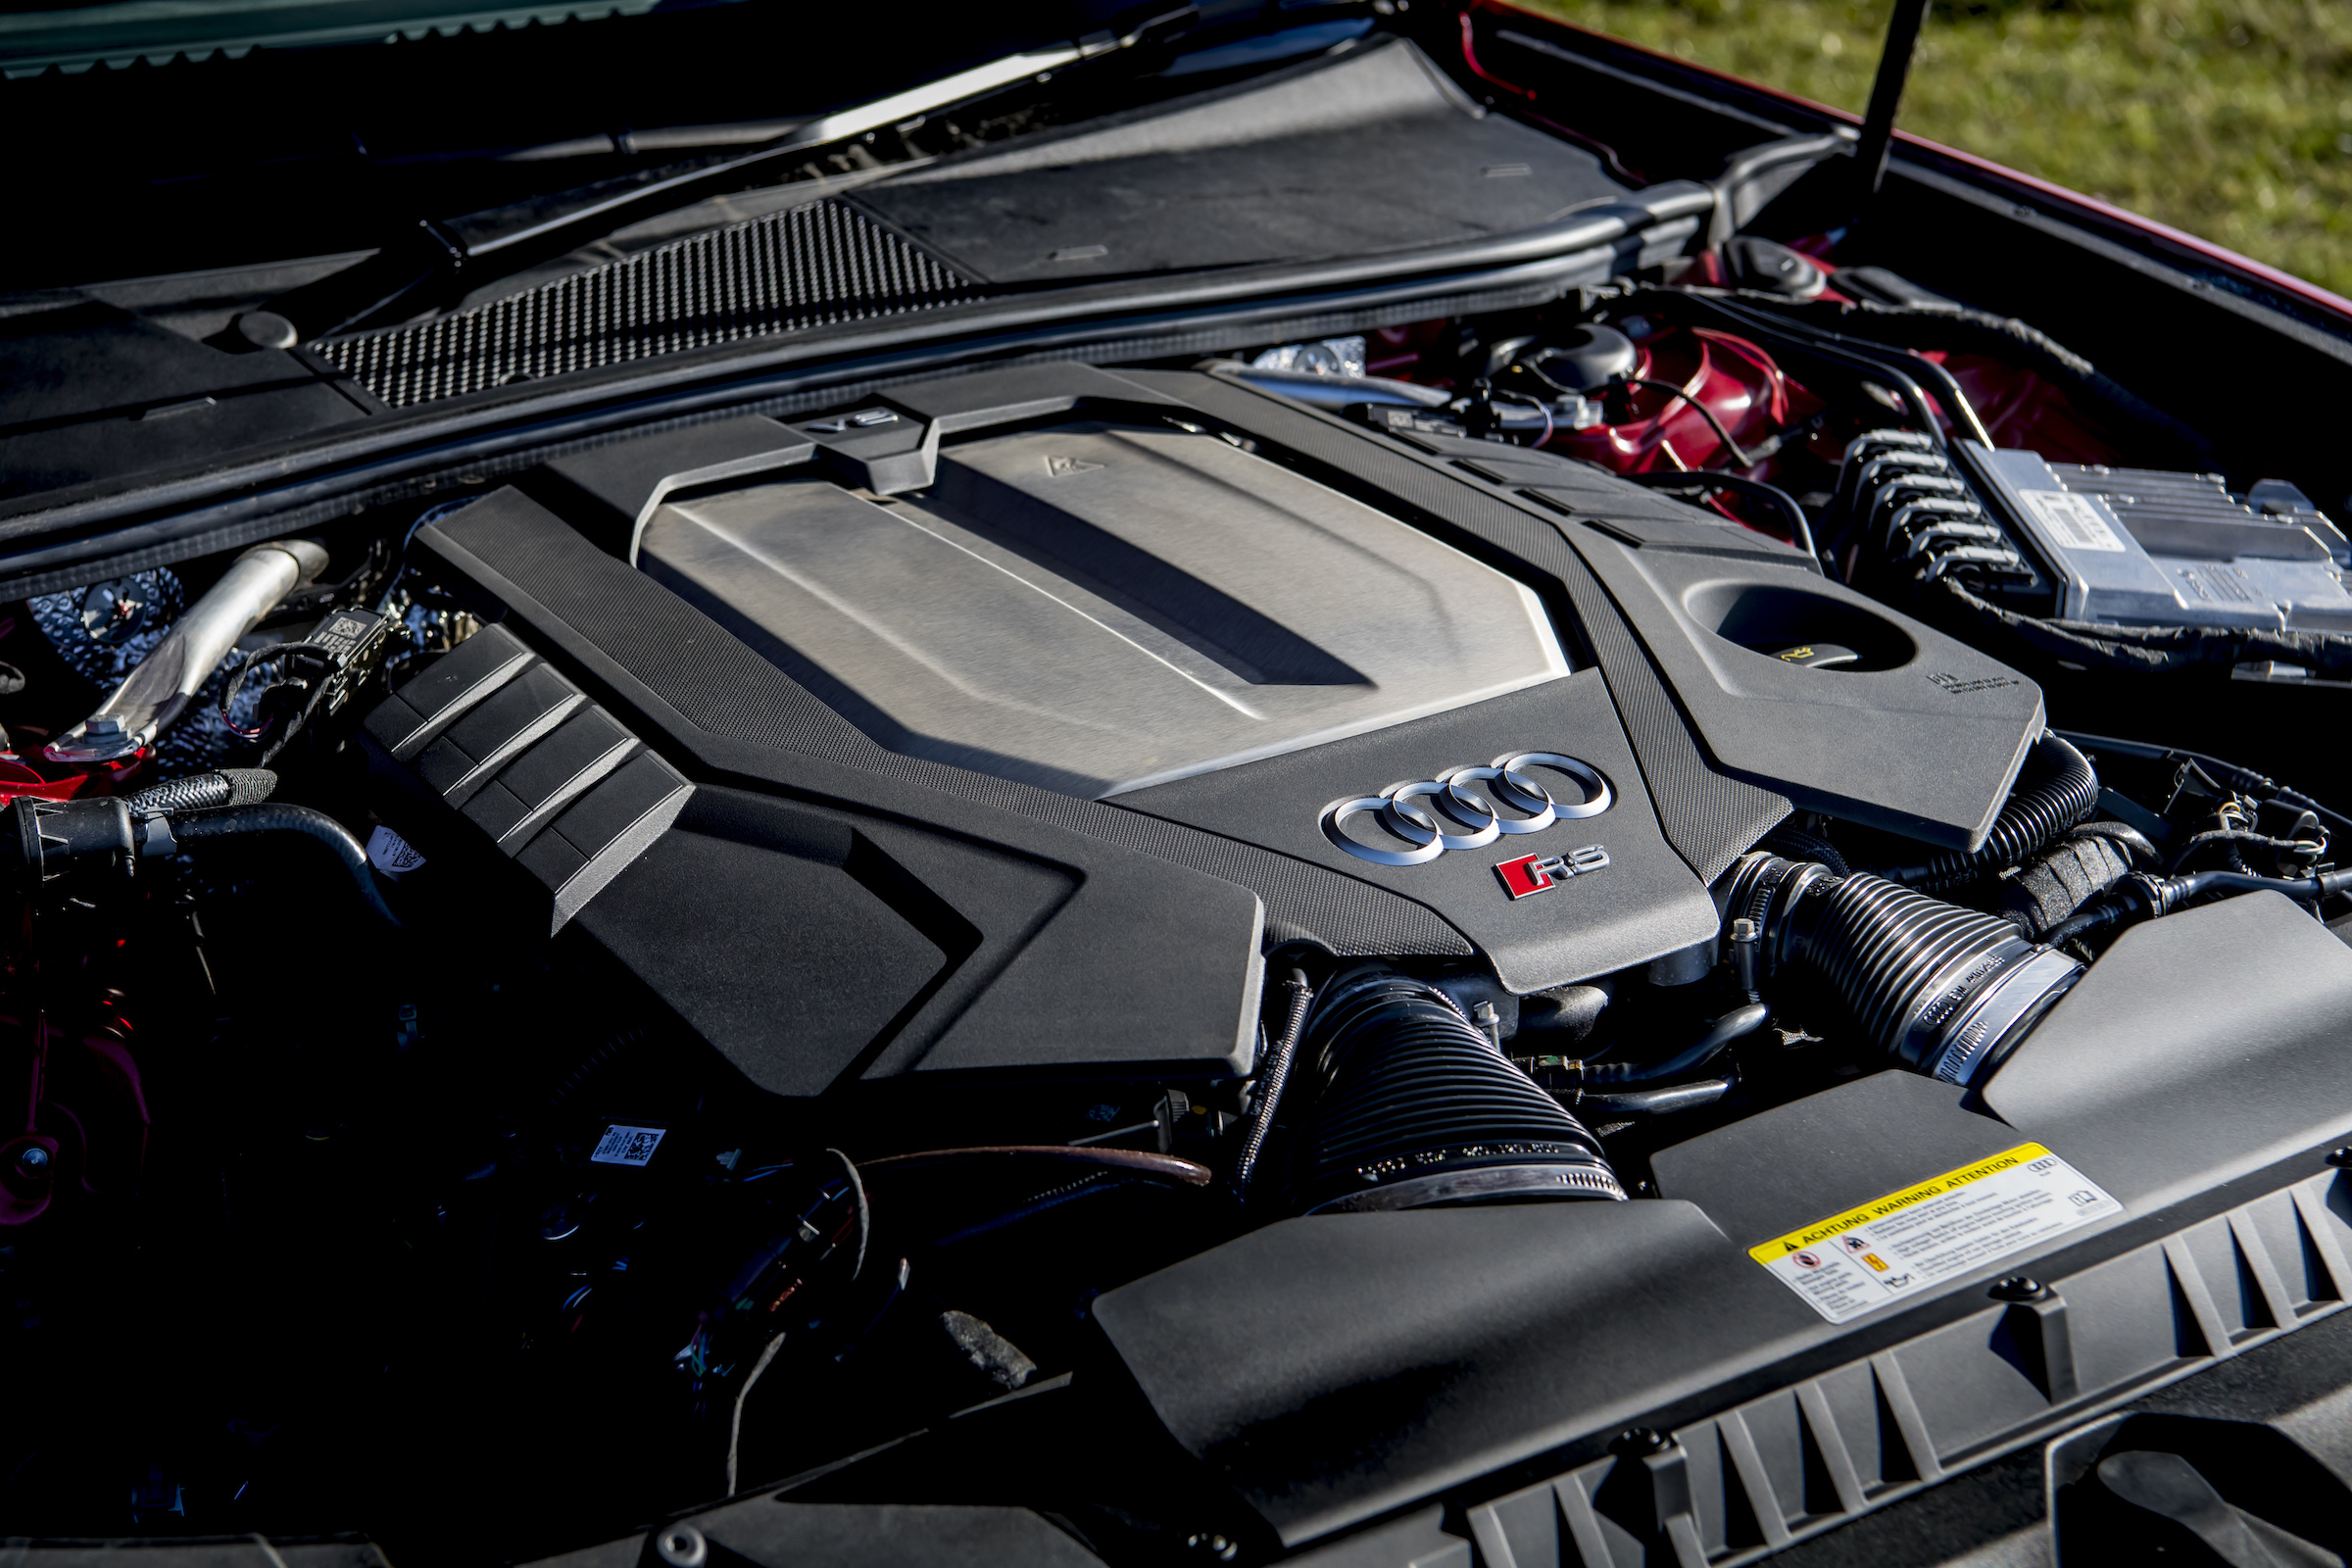 Audi RS6 engine bay